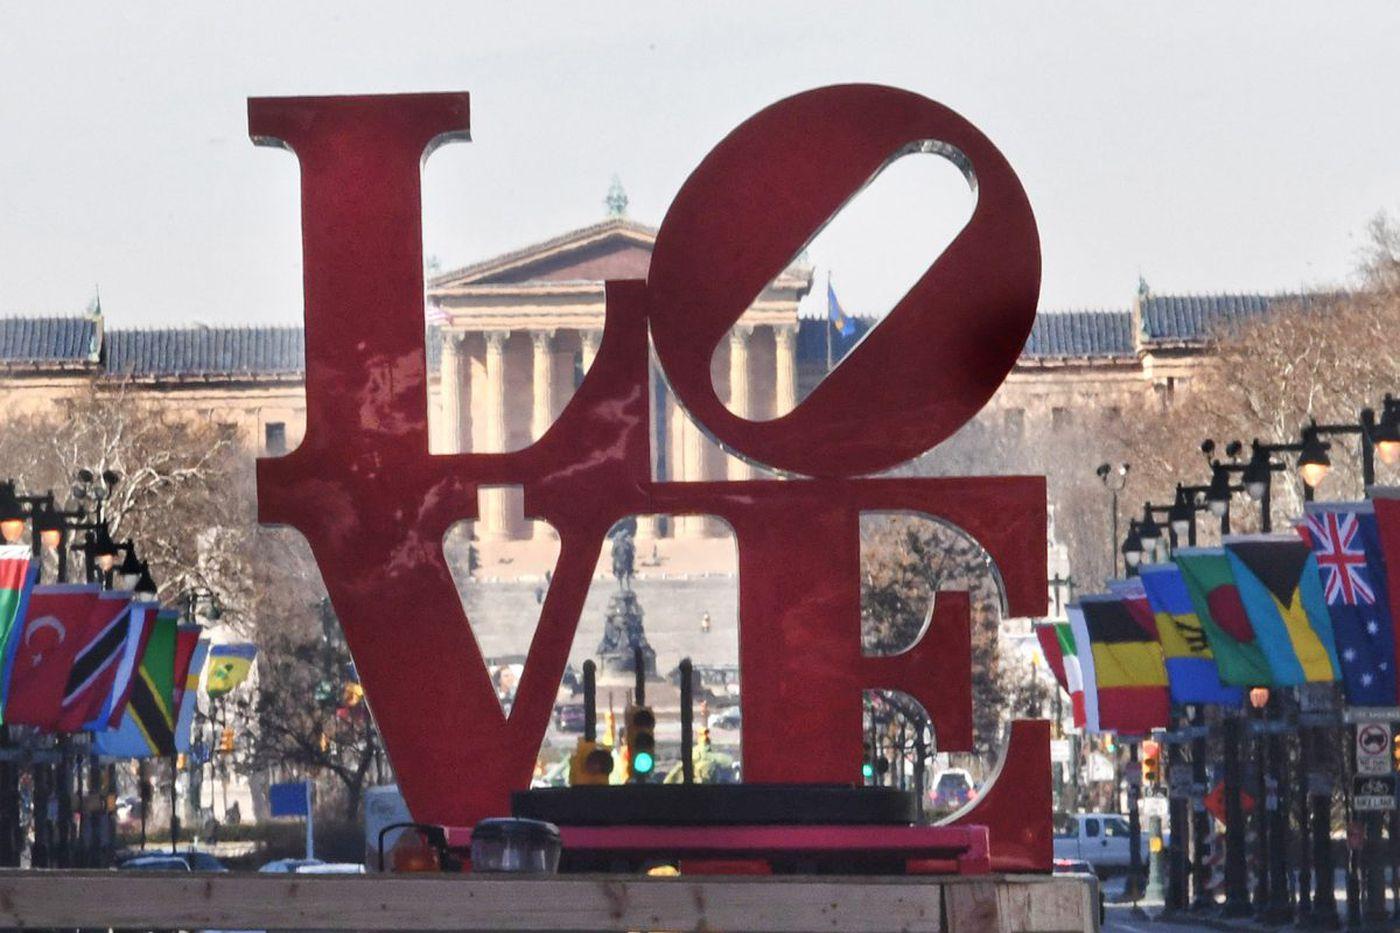 LOVE Park: Absence should make Philadelphia's heart grow fonder | Editorial